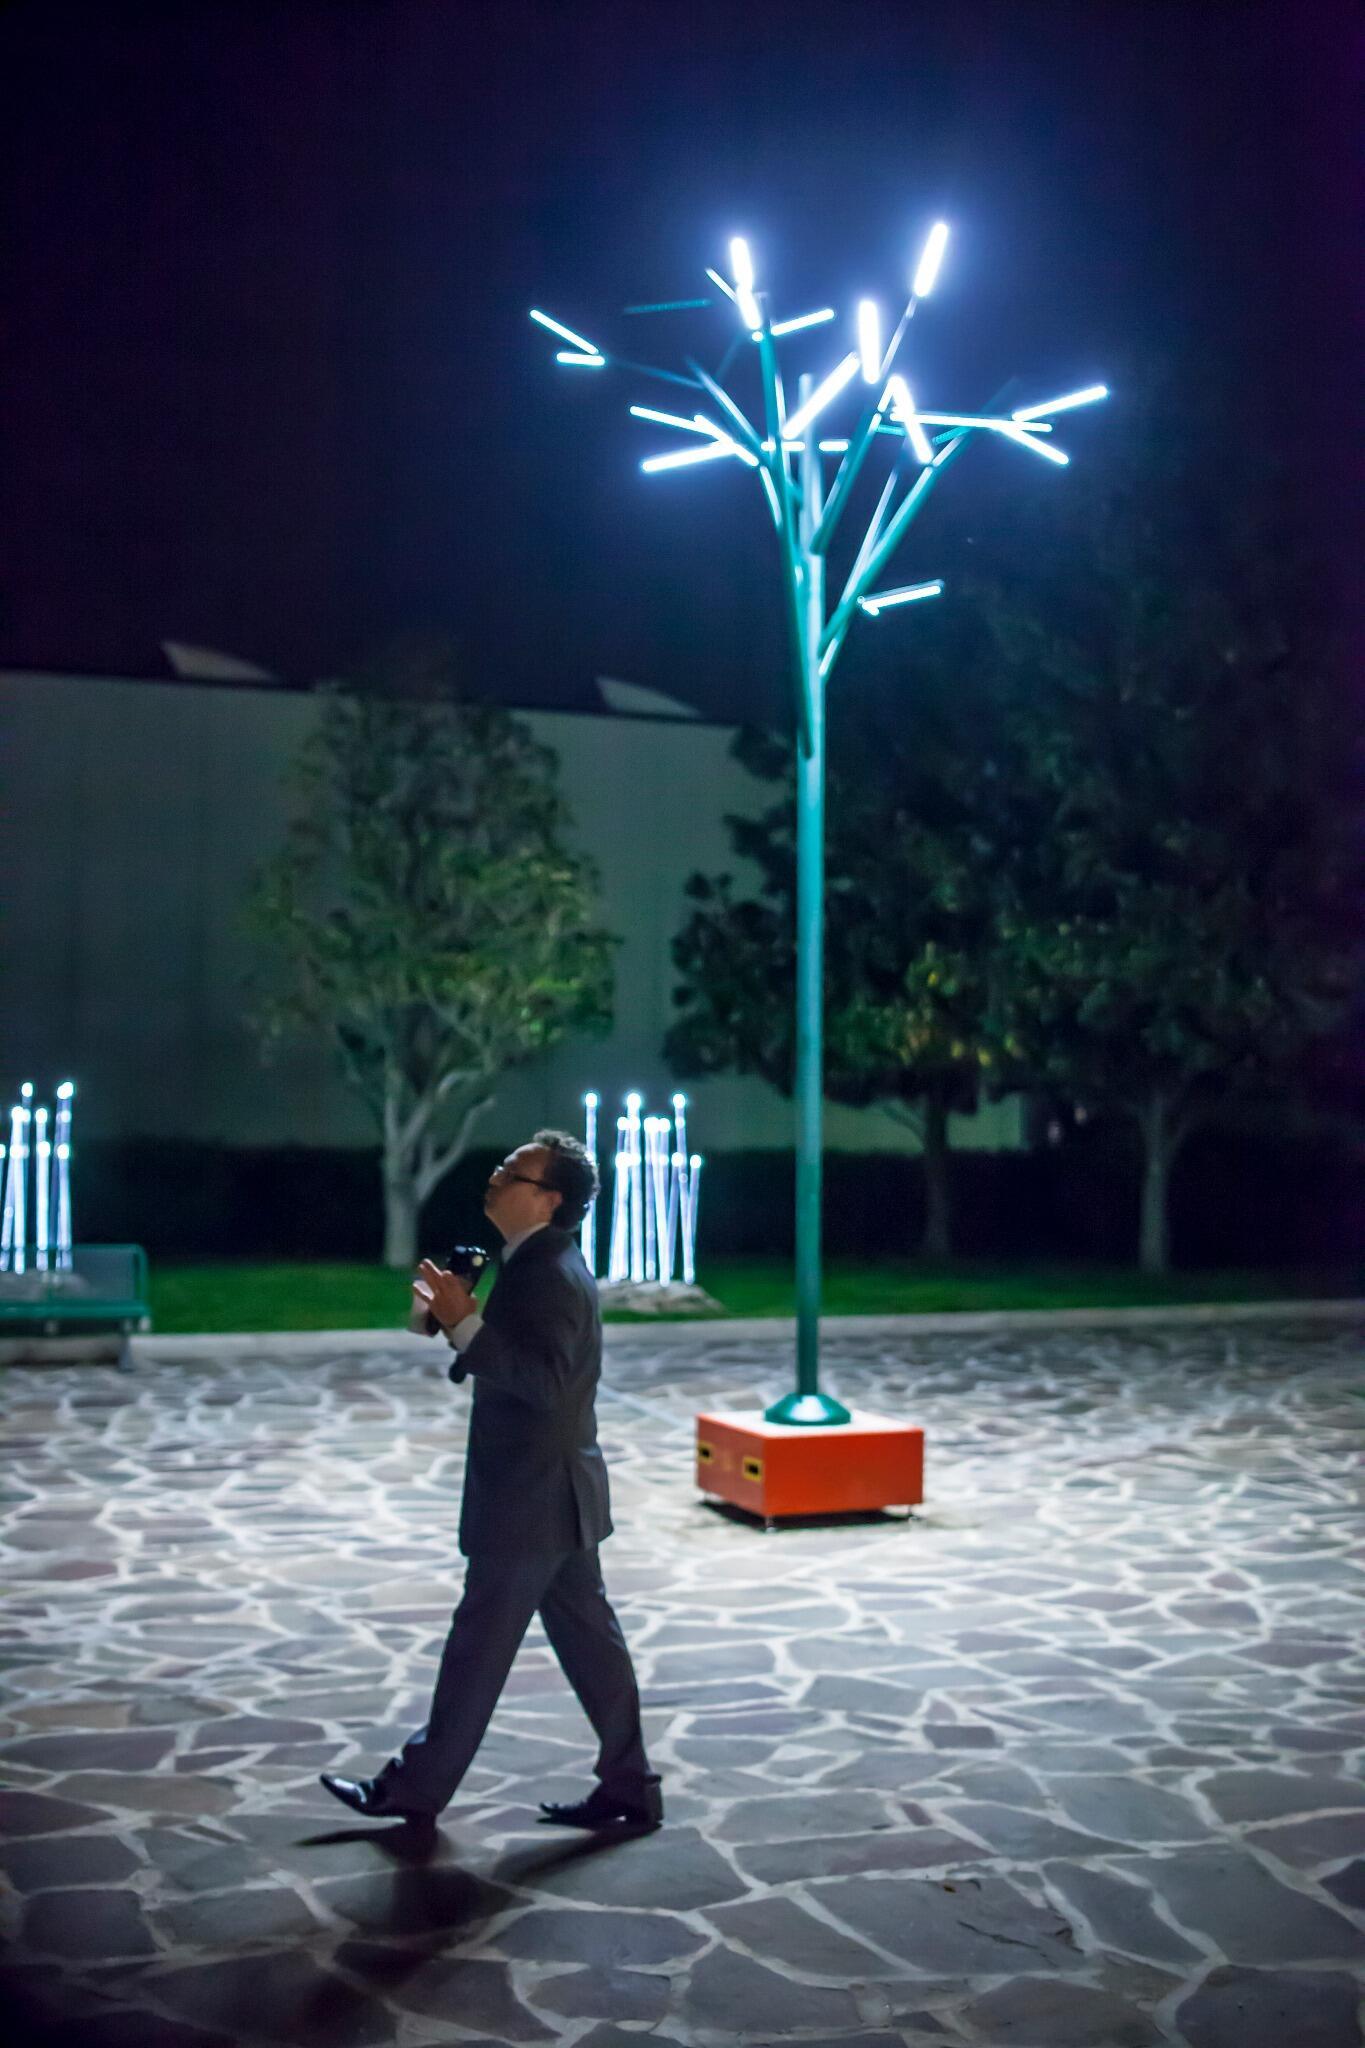 iguzzini on twitter 39 albero 39 urban lighting fitting. Black Bedroom Furniture Sets. Home Design Ideas